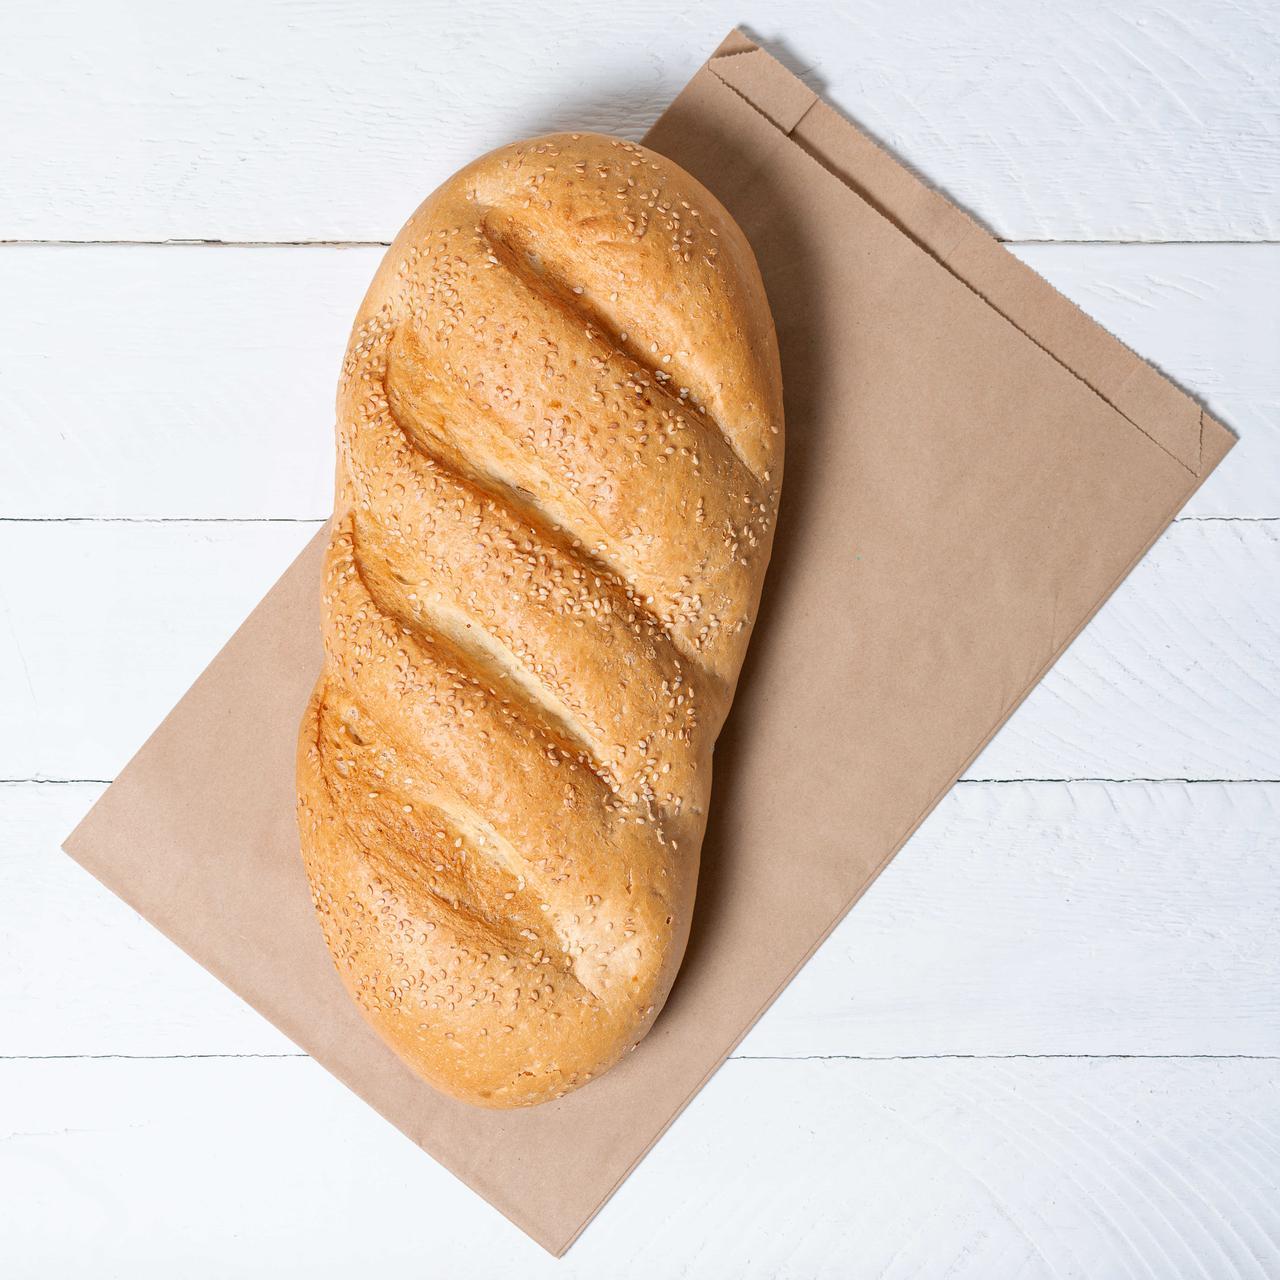 Паперовий упаковочный пакет для хліба 220*60*340 мм крафт пакет бурий